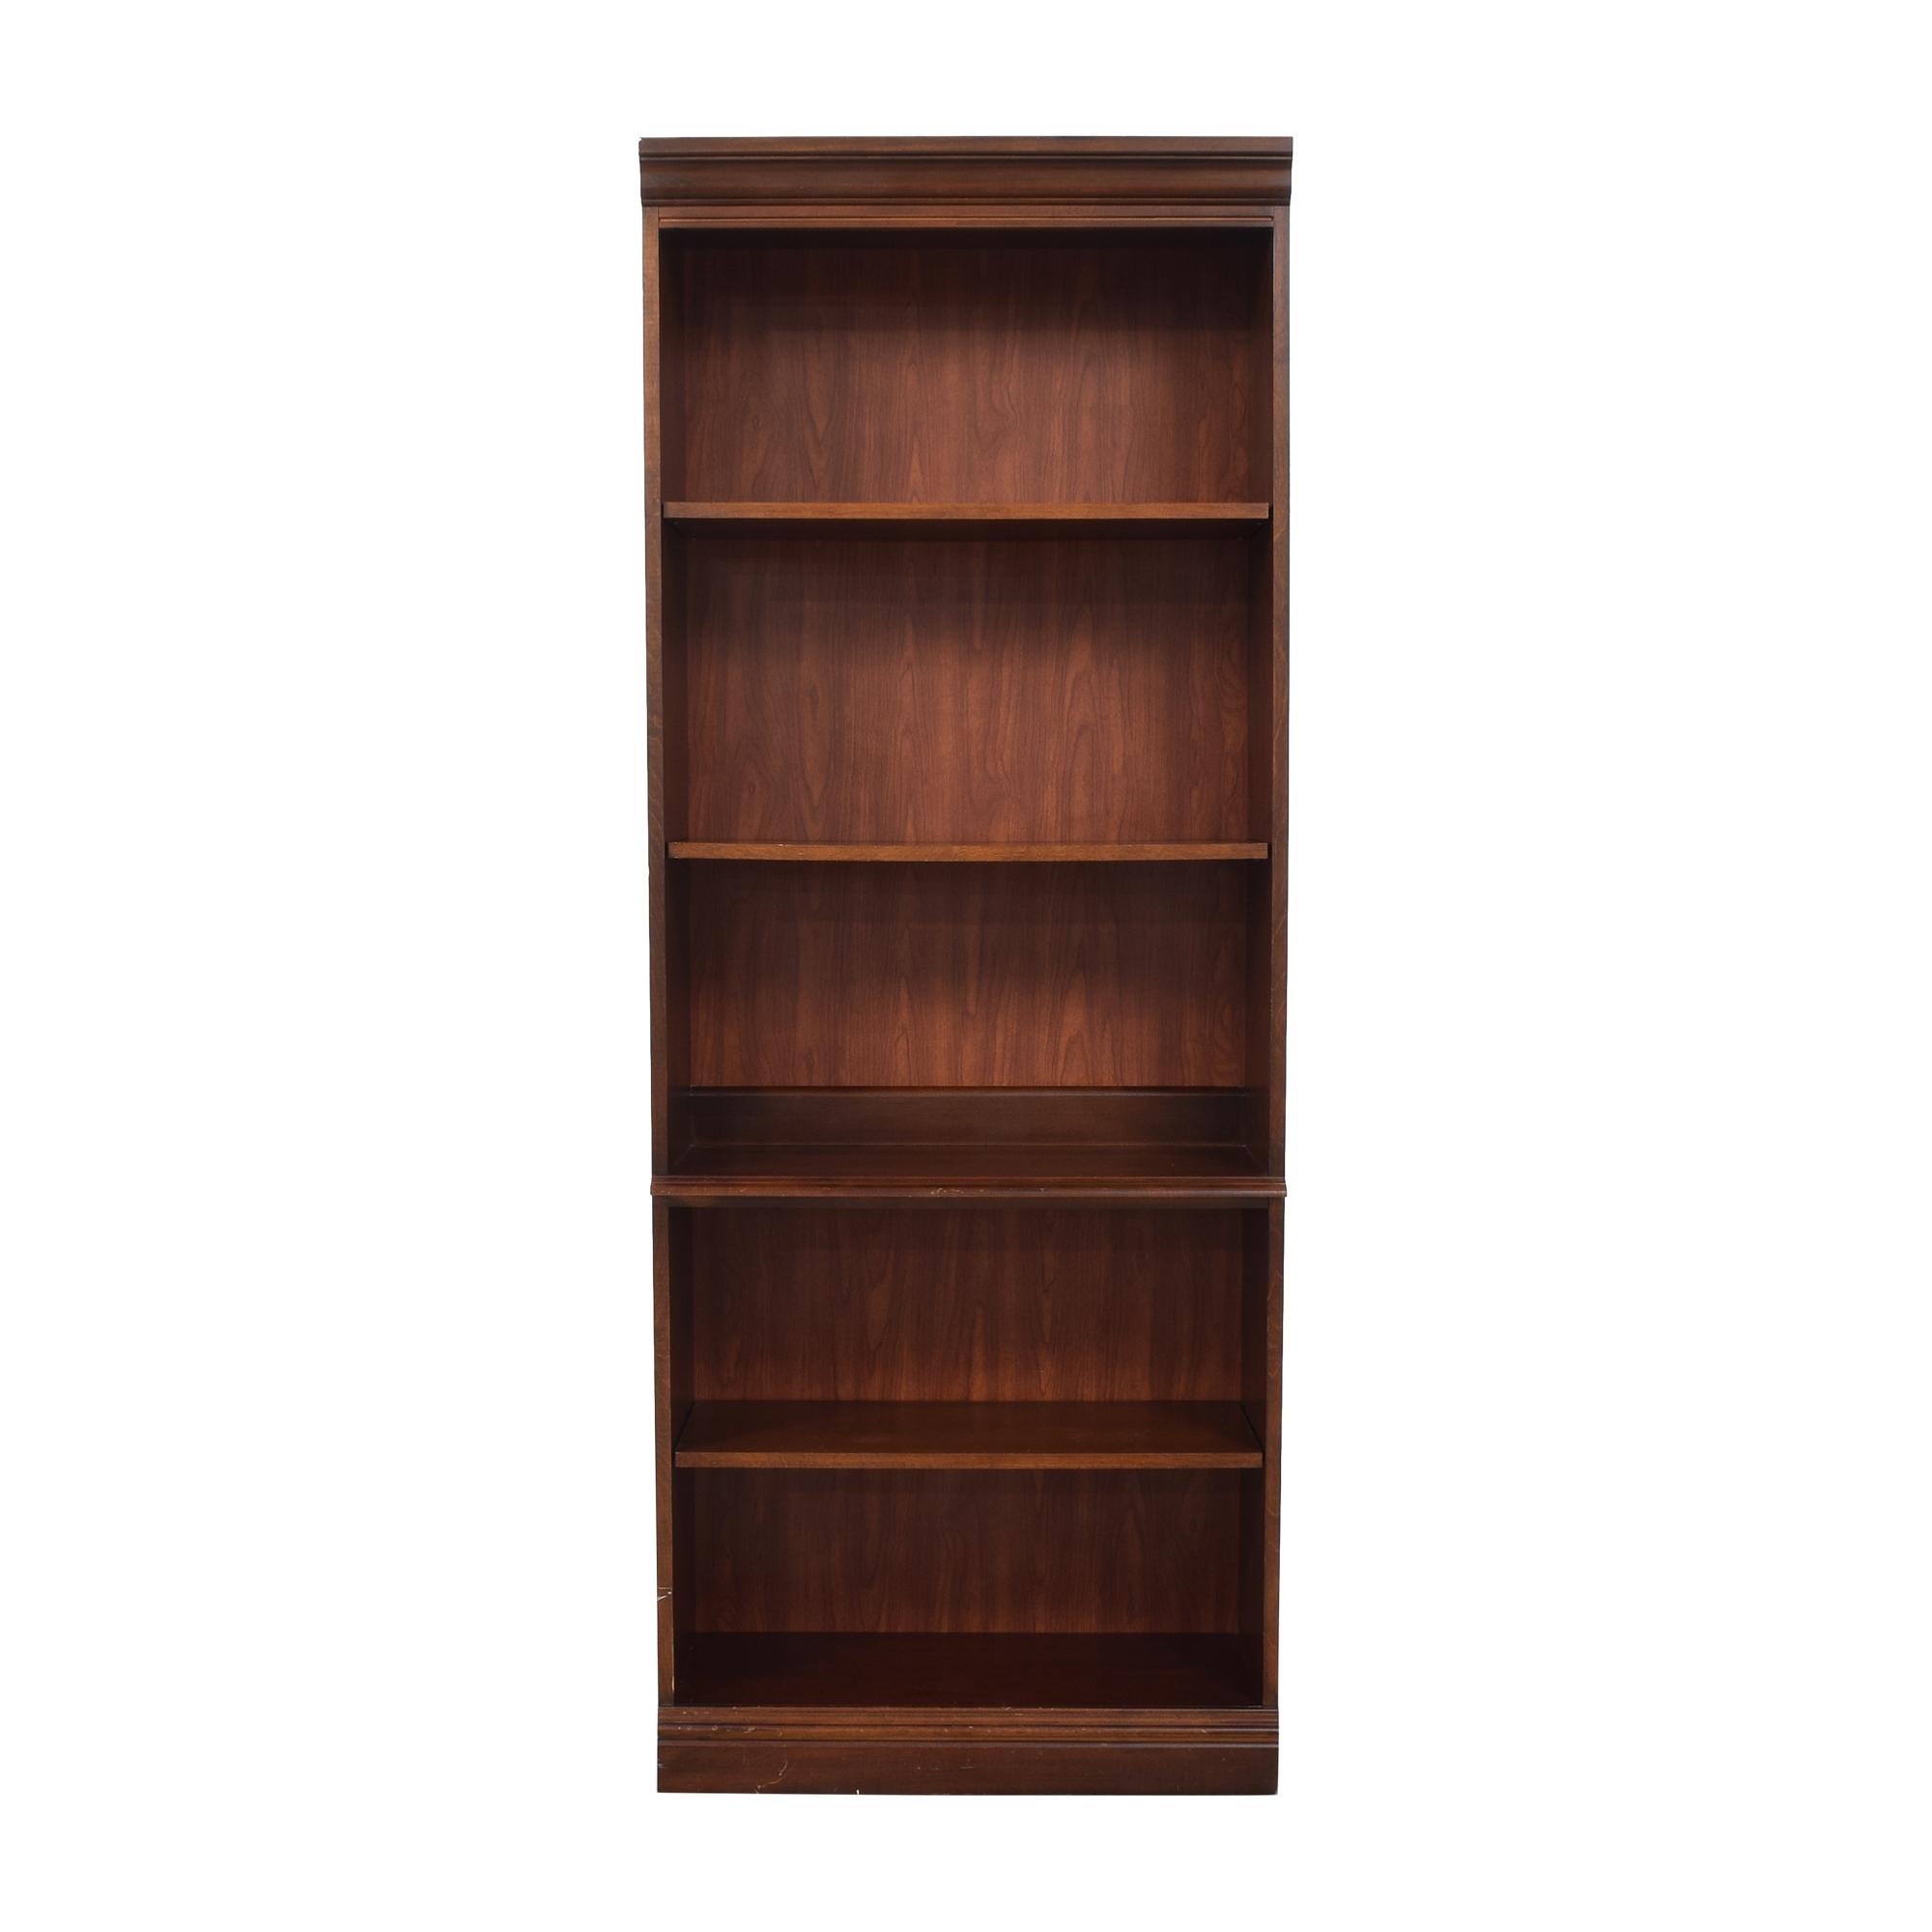 Hooker Furniture Hooker Furniture Tall Bookcase Bookcases & Shelving